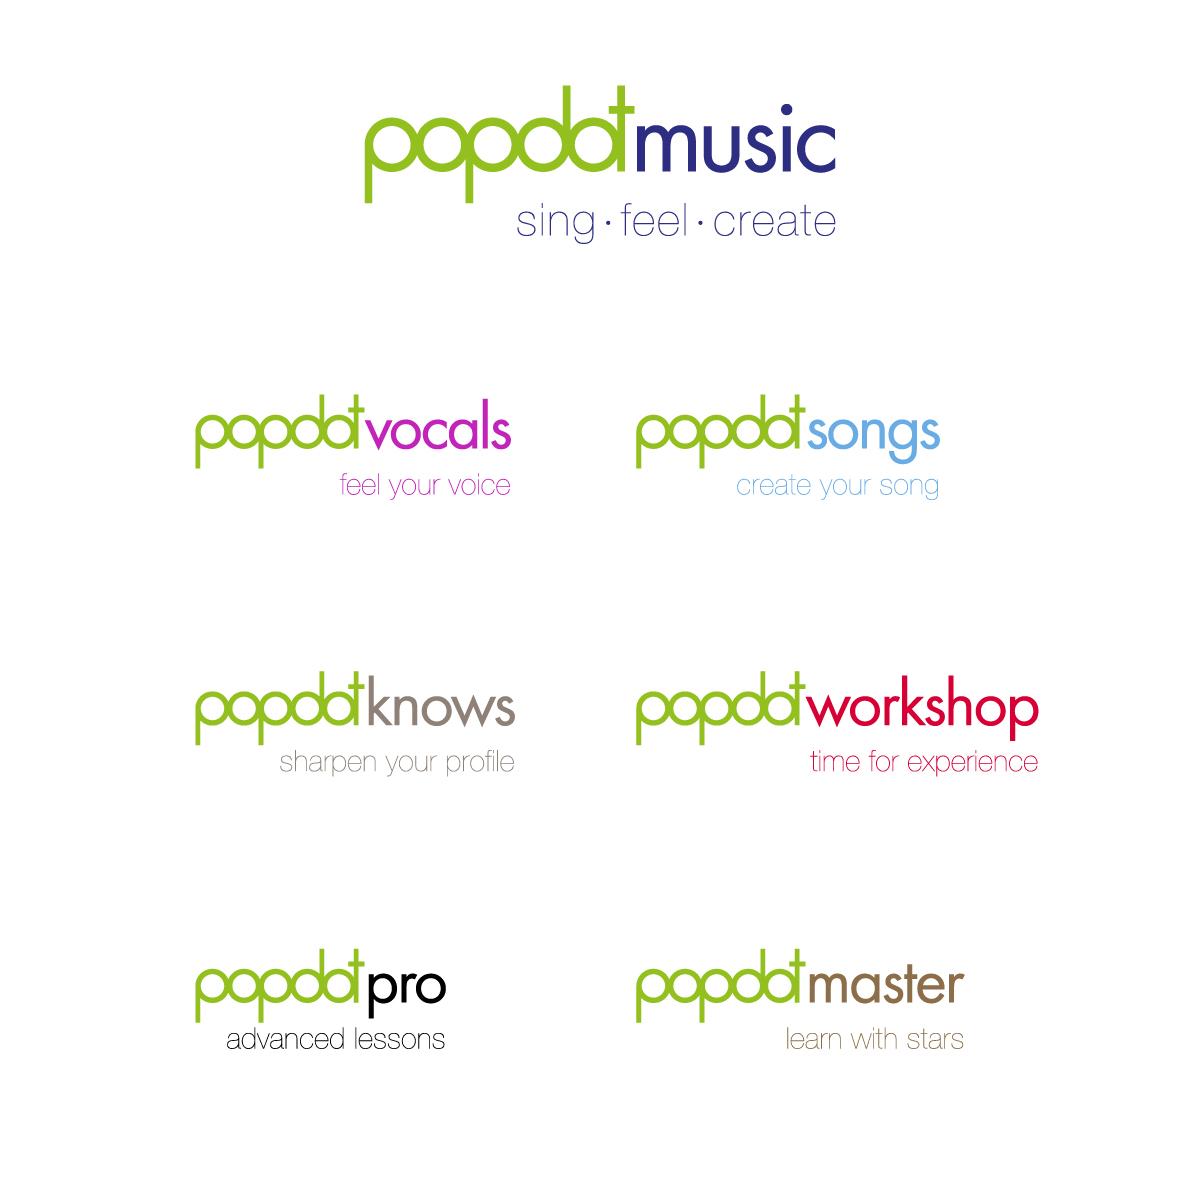 popdotmusic